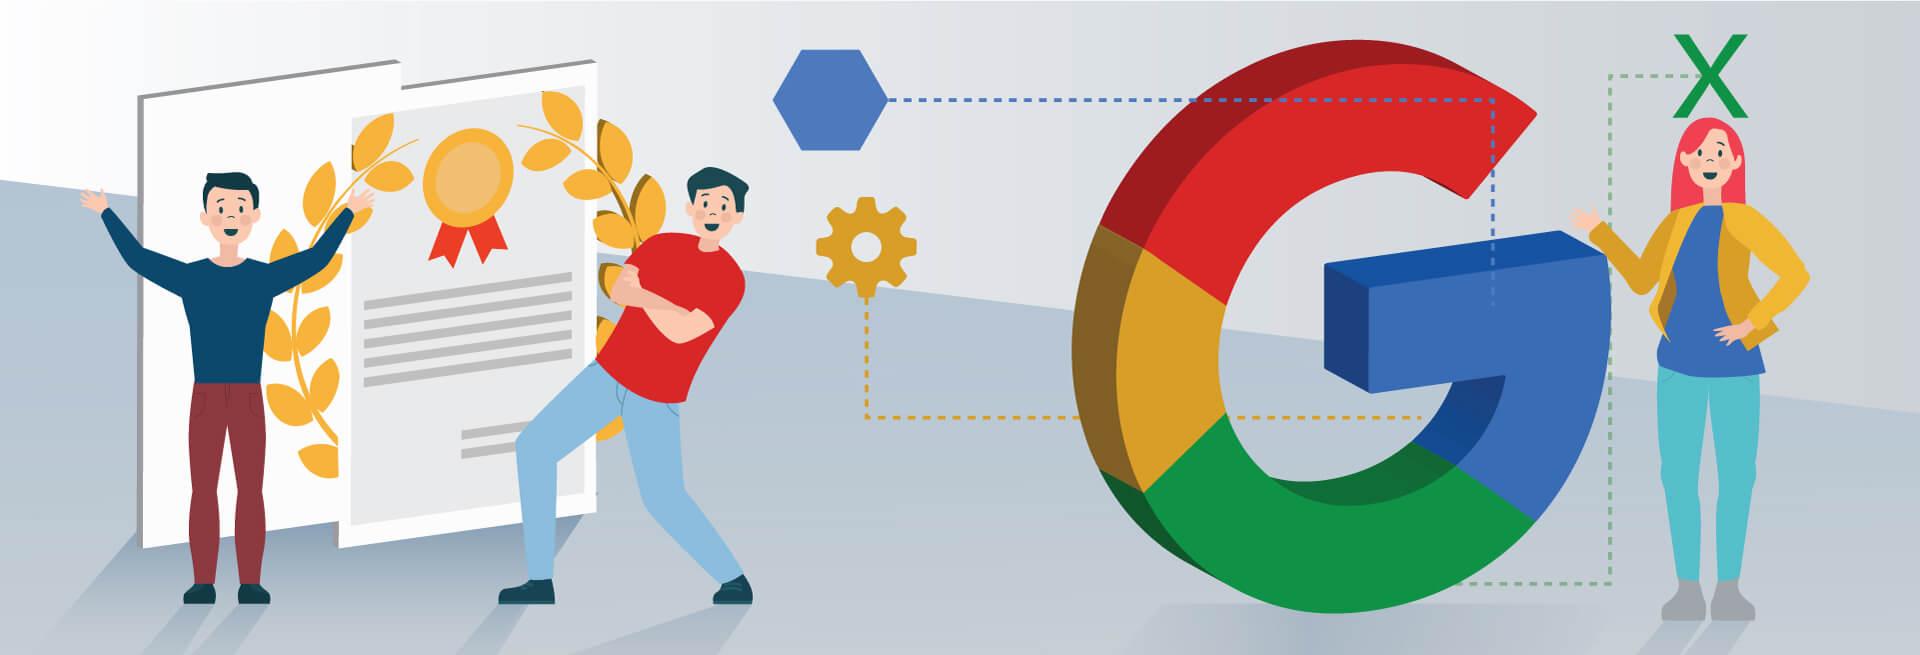 Google licensing program update